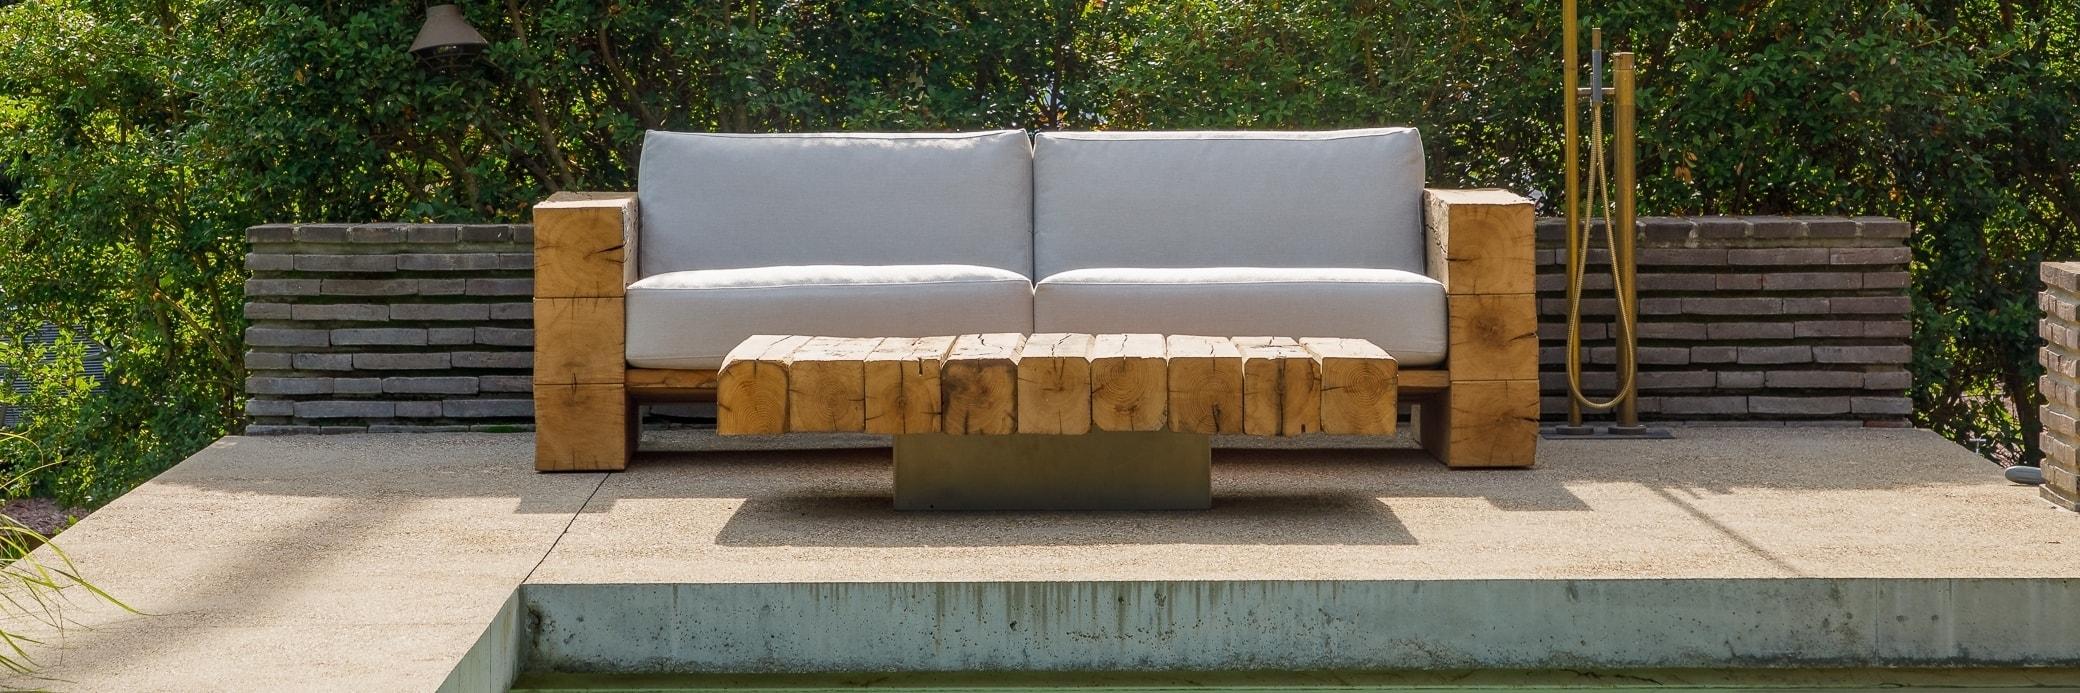 Outdoor Rustic Wood Coffee Table   Made in France   Oakâme